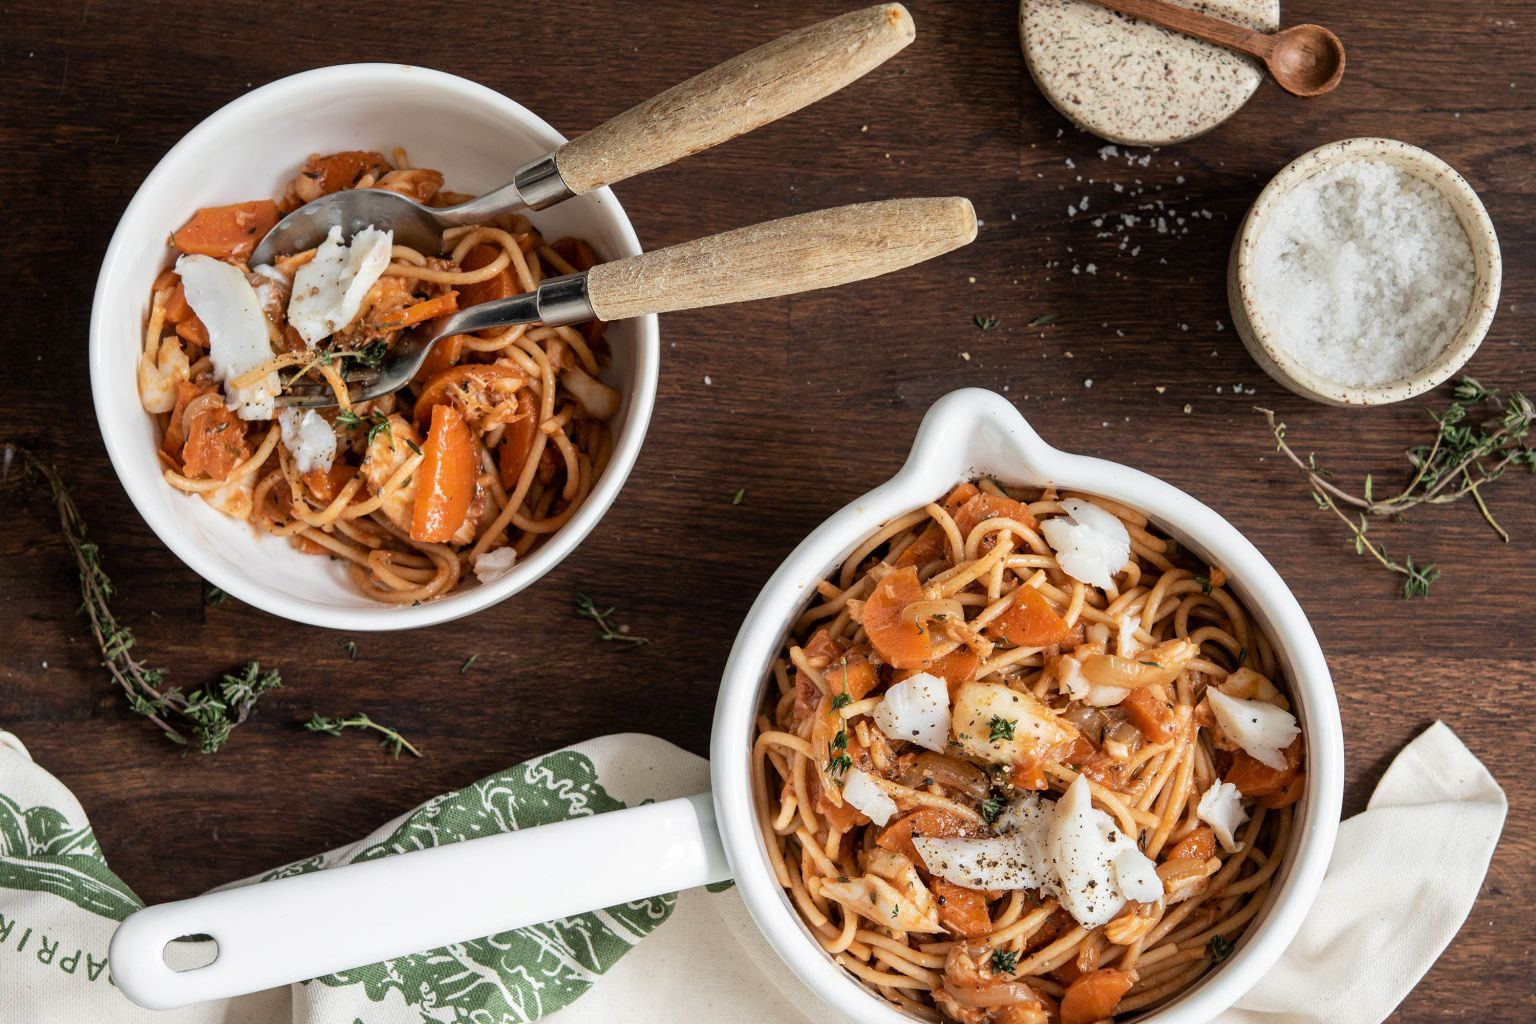 Spaghetti à la bolognaise de poisson blanc